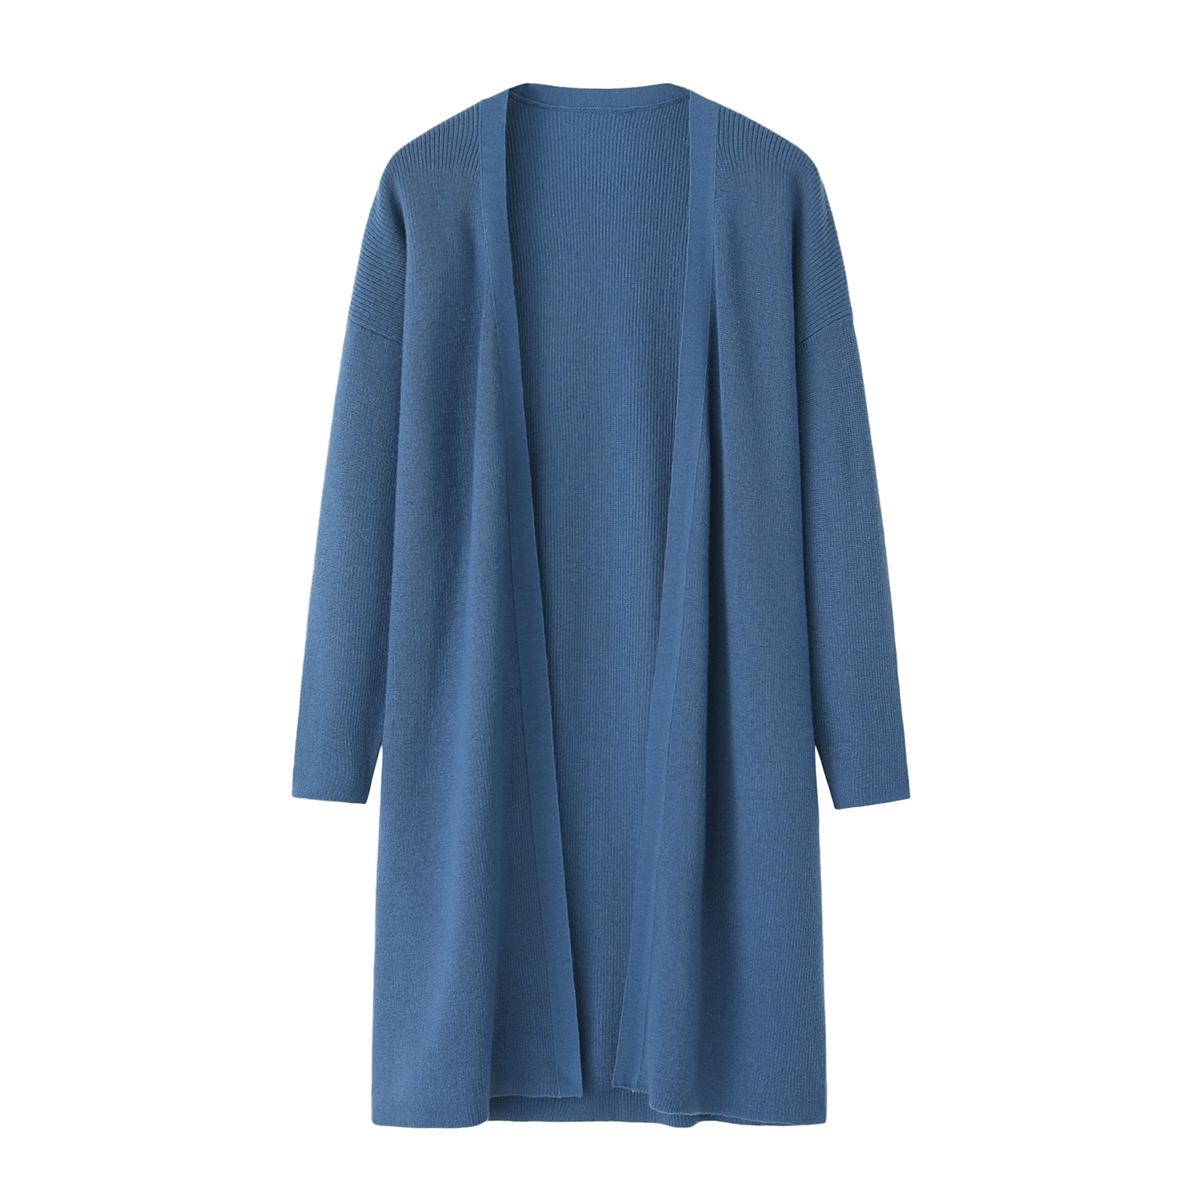 Xingrong genuine autumn and winter new worsted pure sweater womens medium long knitting thin cardigan coat